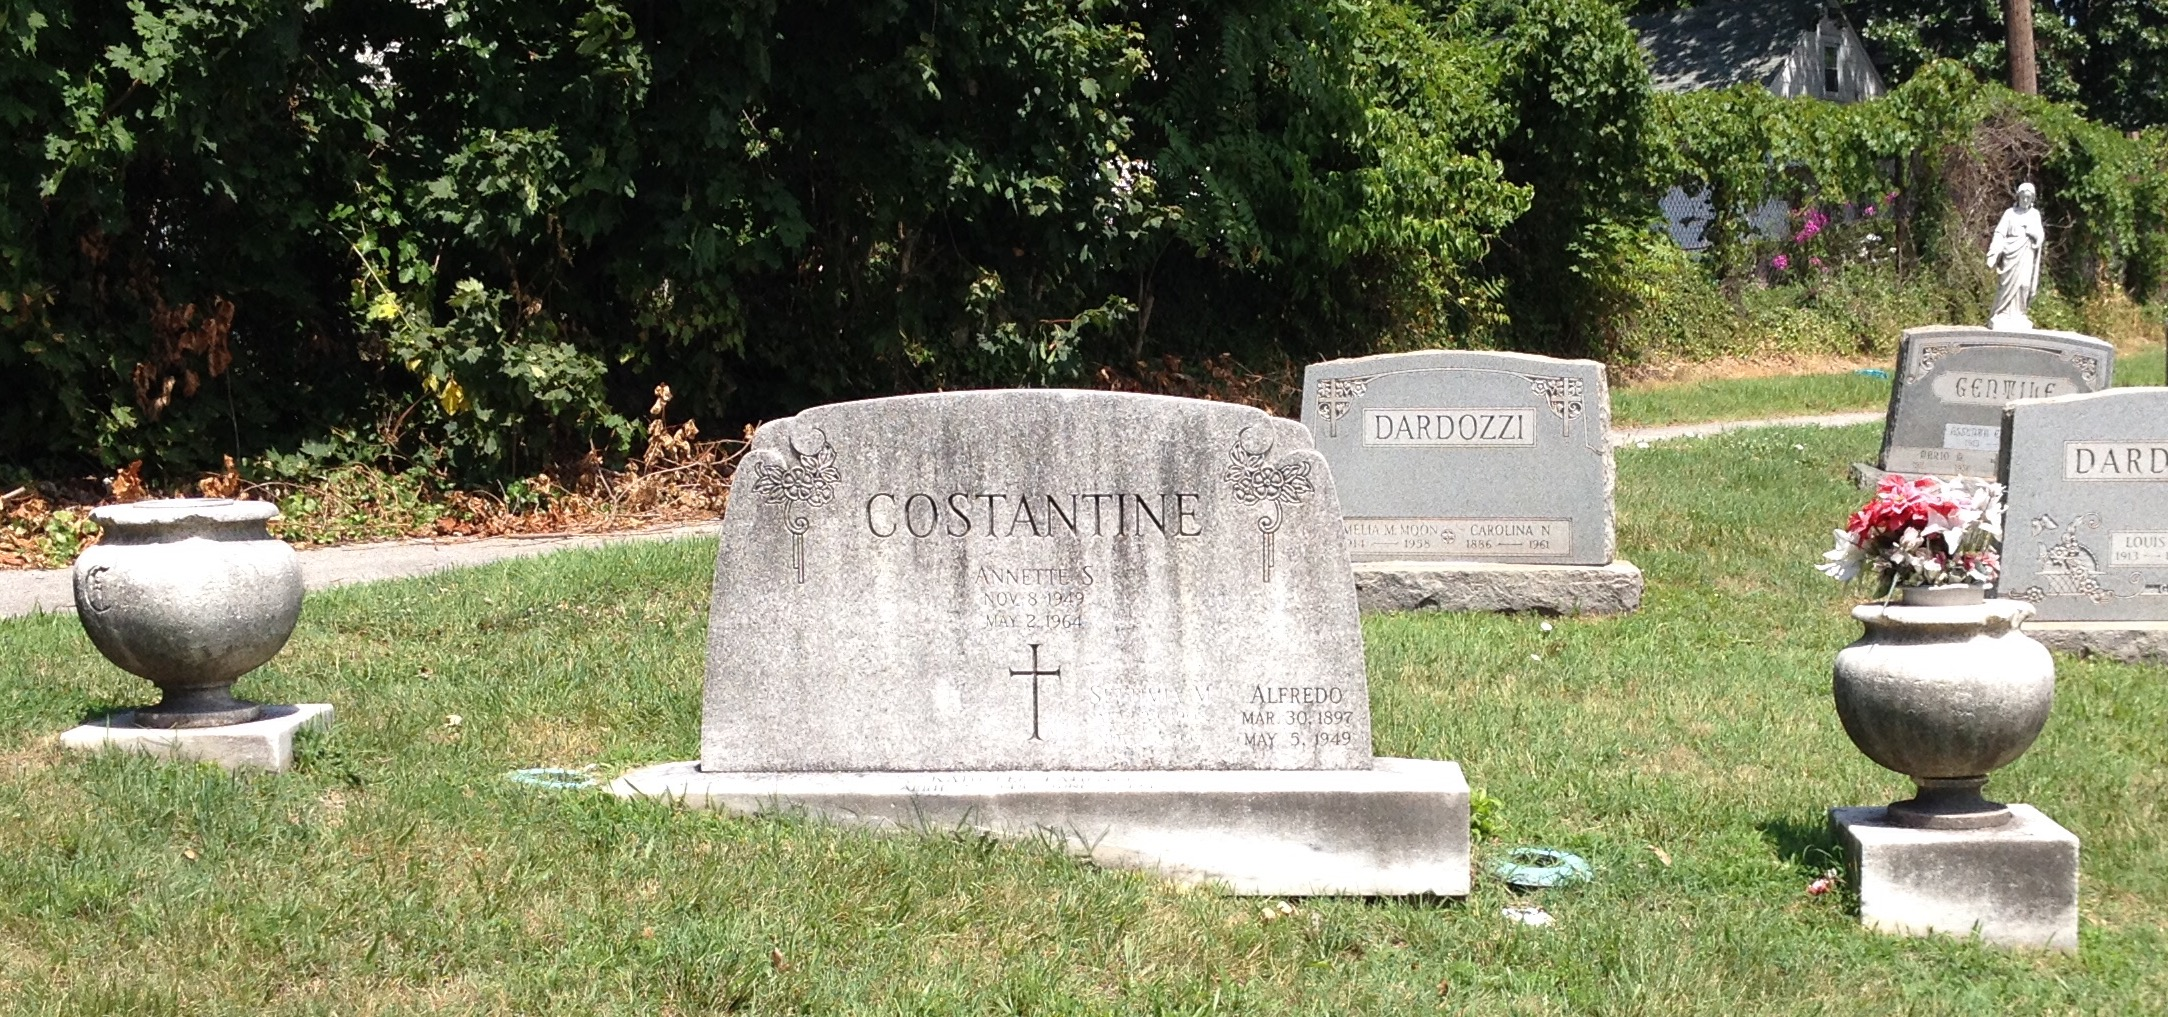 Annette S  Costantine (1949-1964) - Find A Grave Memorial